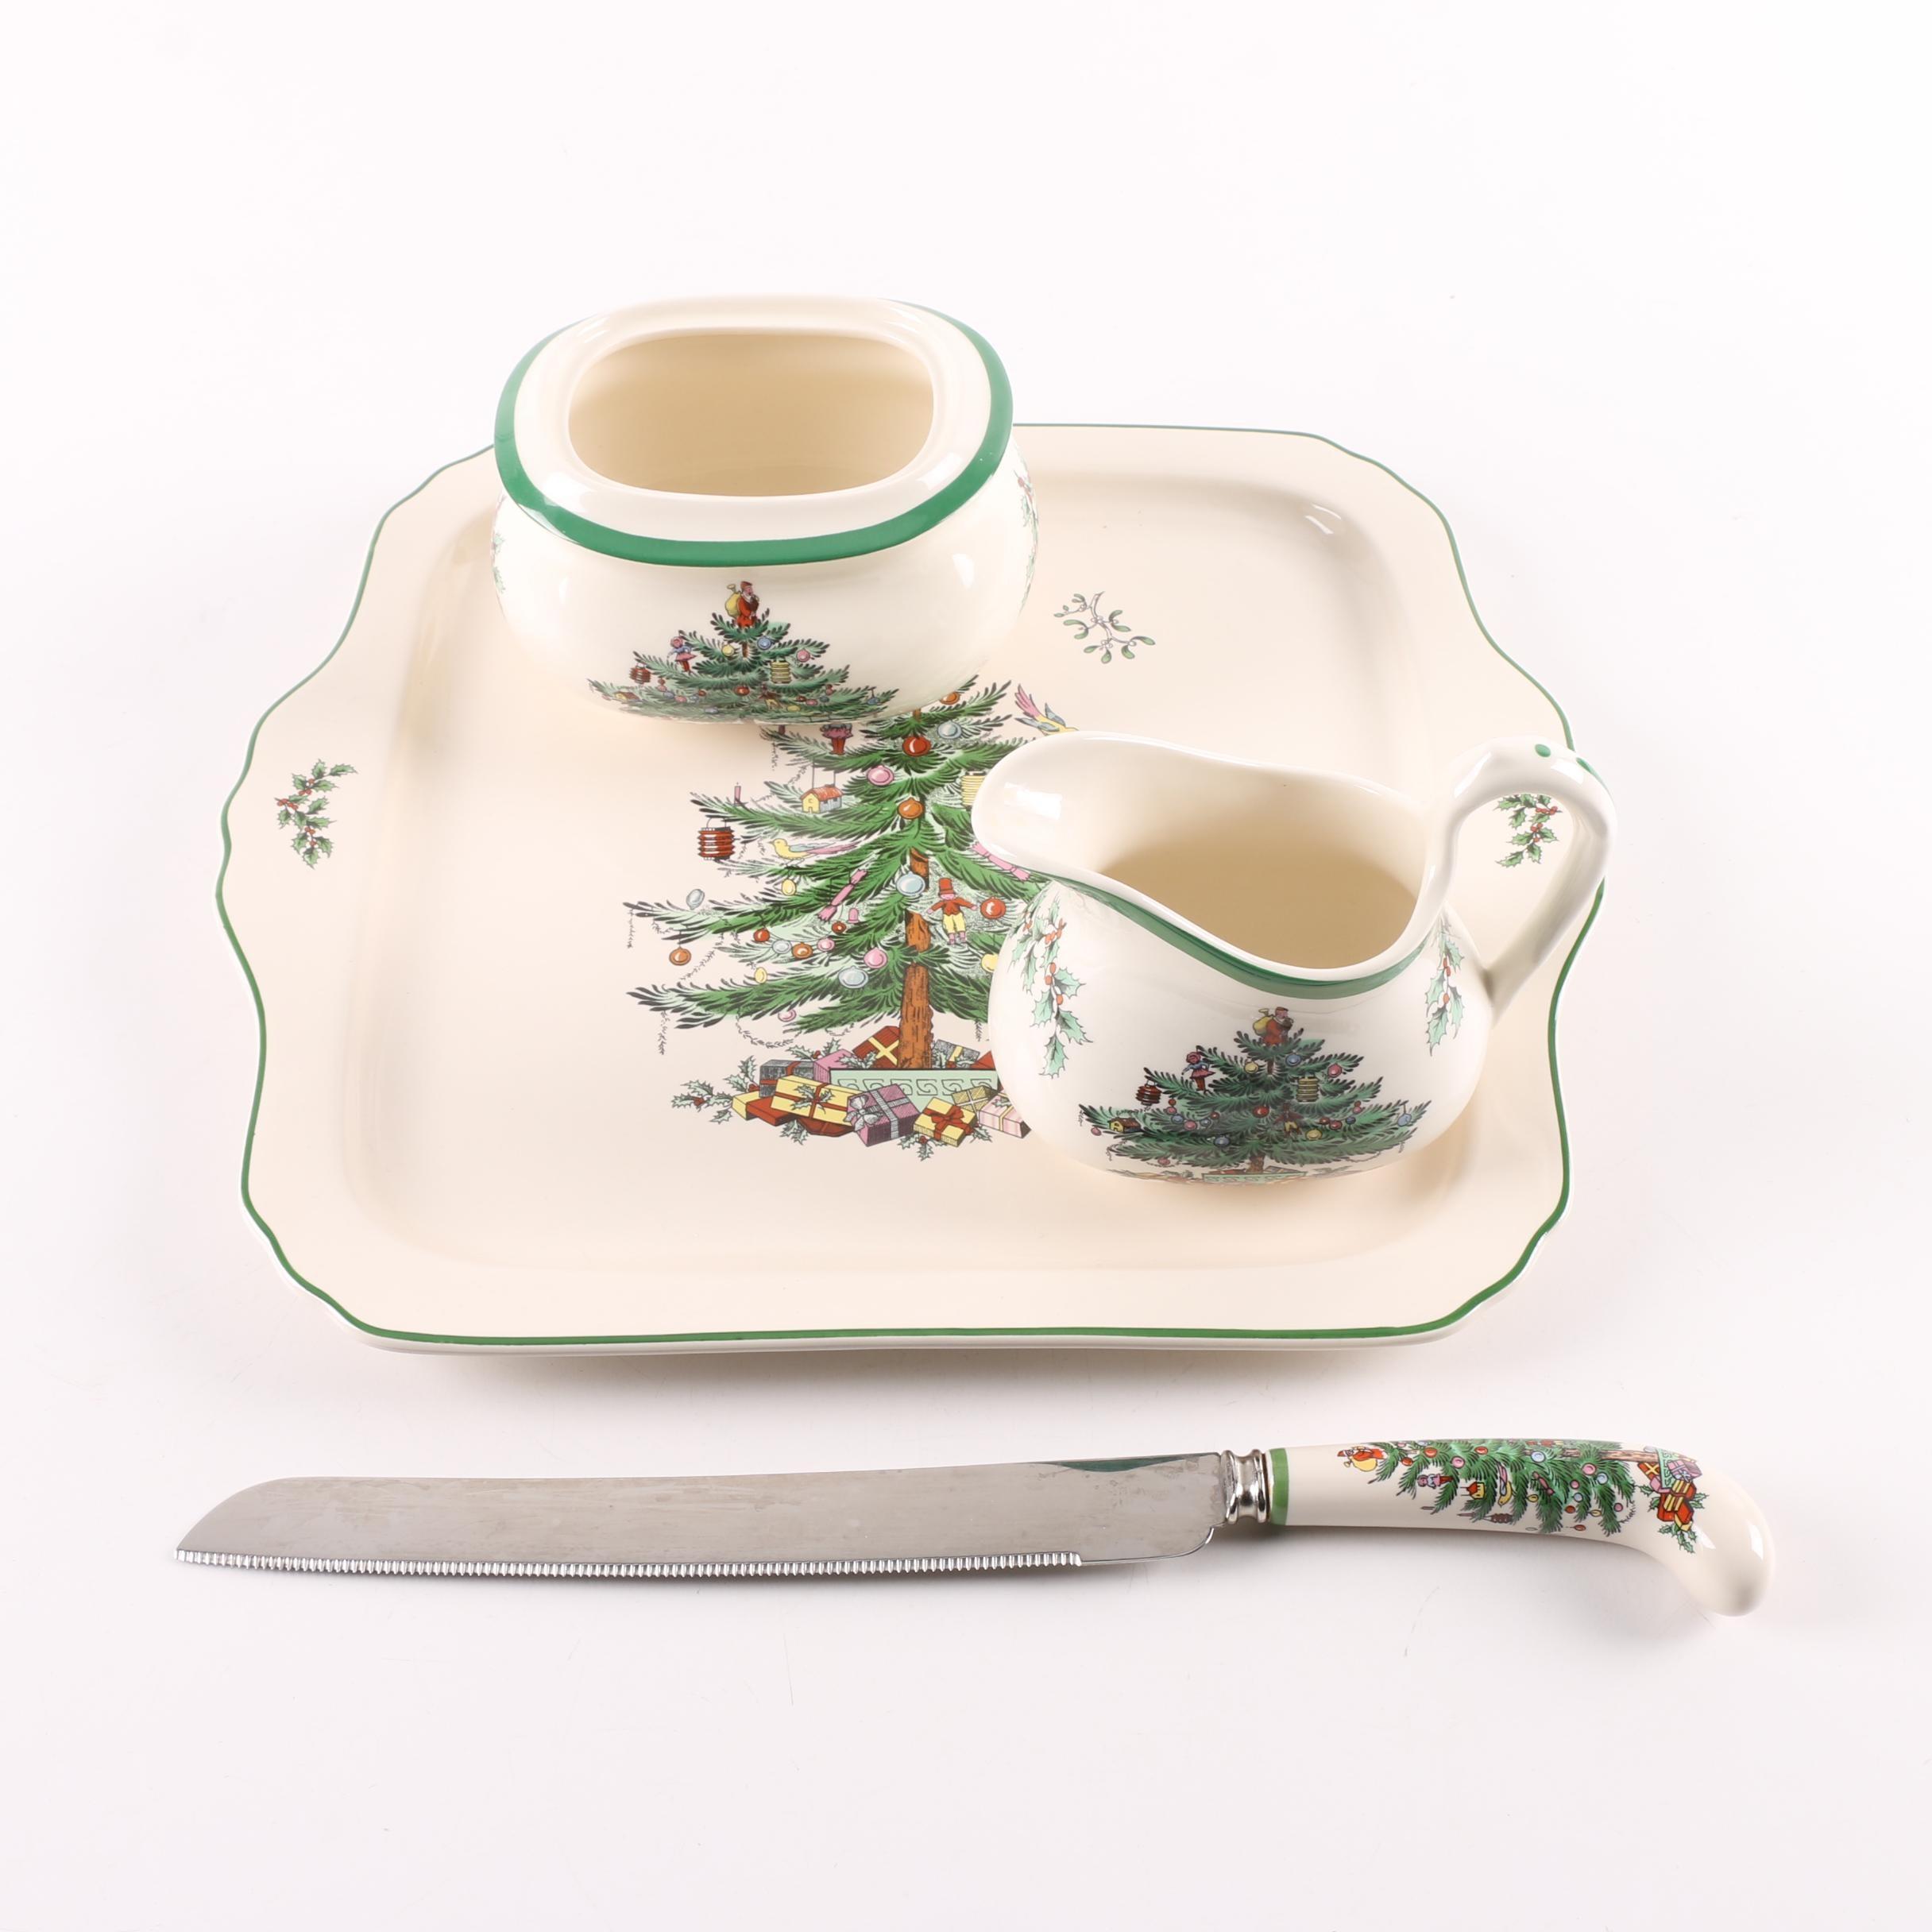 "Spode ""Christmas Tree"" Ceramic Platter, Bread knife, Creamer and Sugar"